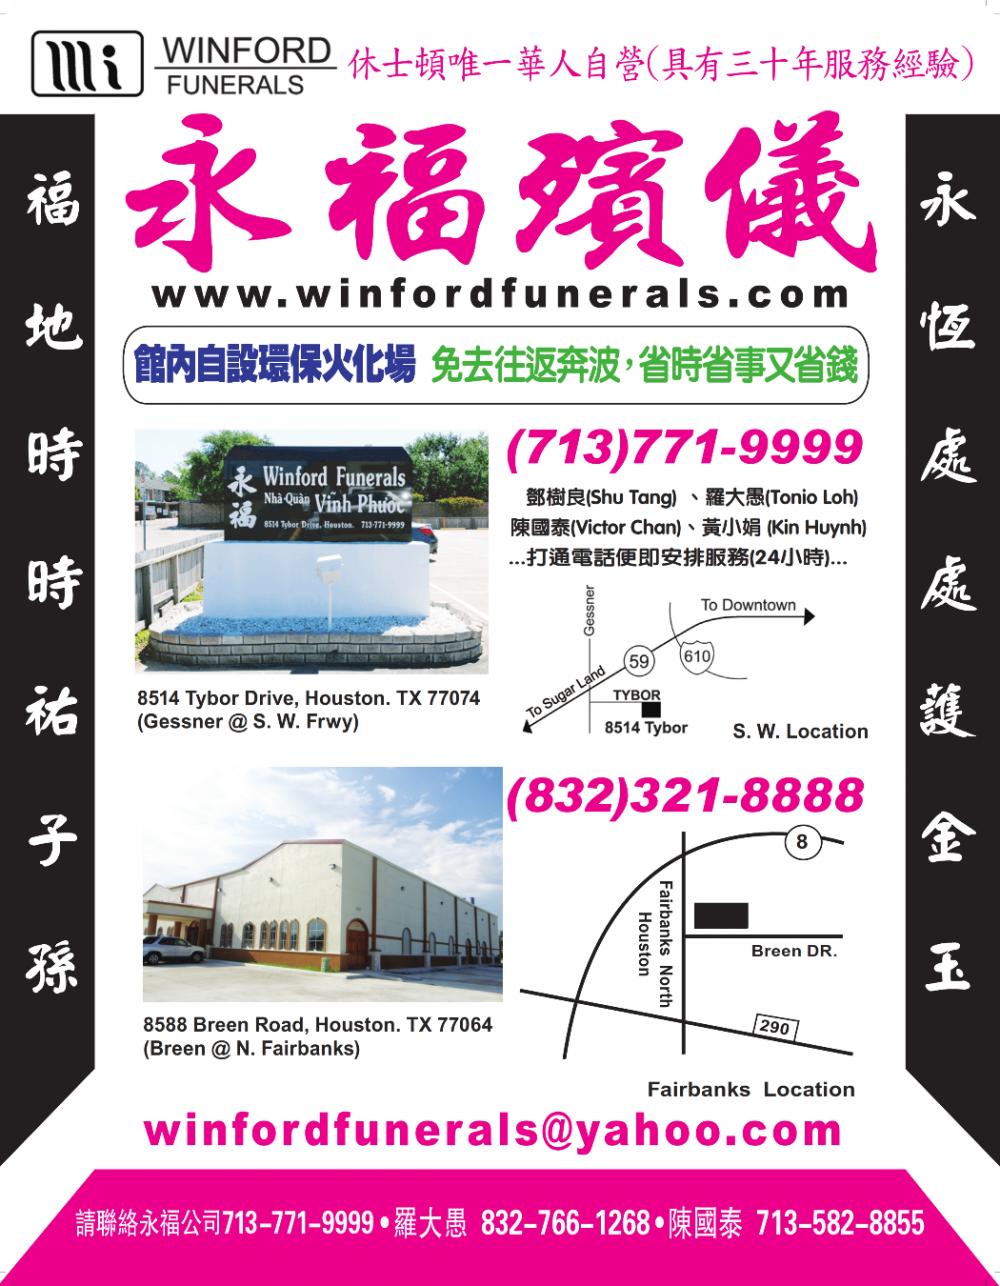 WINFORD FUNERALS 永福殯儀館